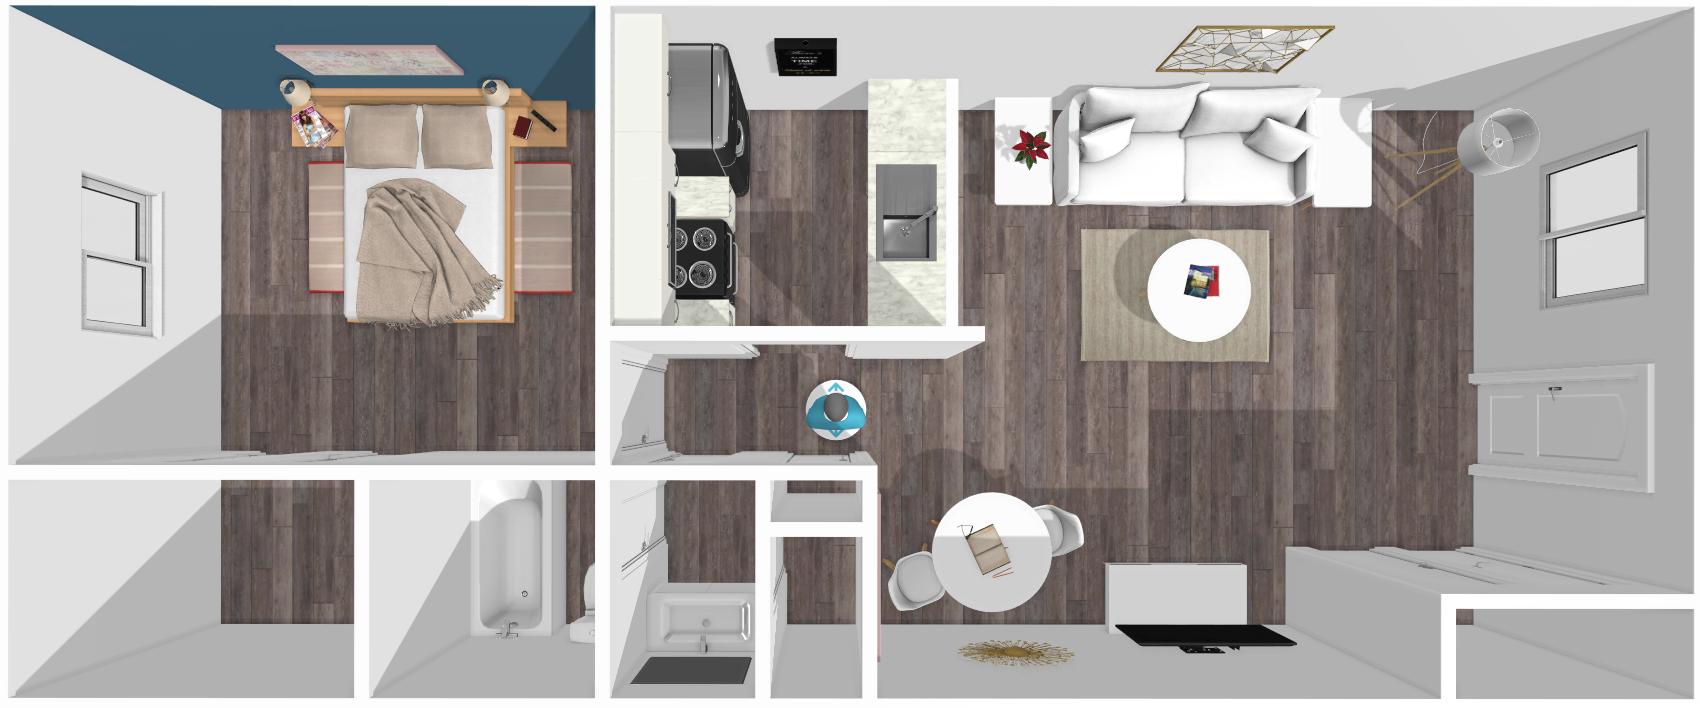 Floor plan image of Austin 1 Bed